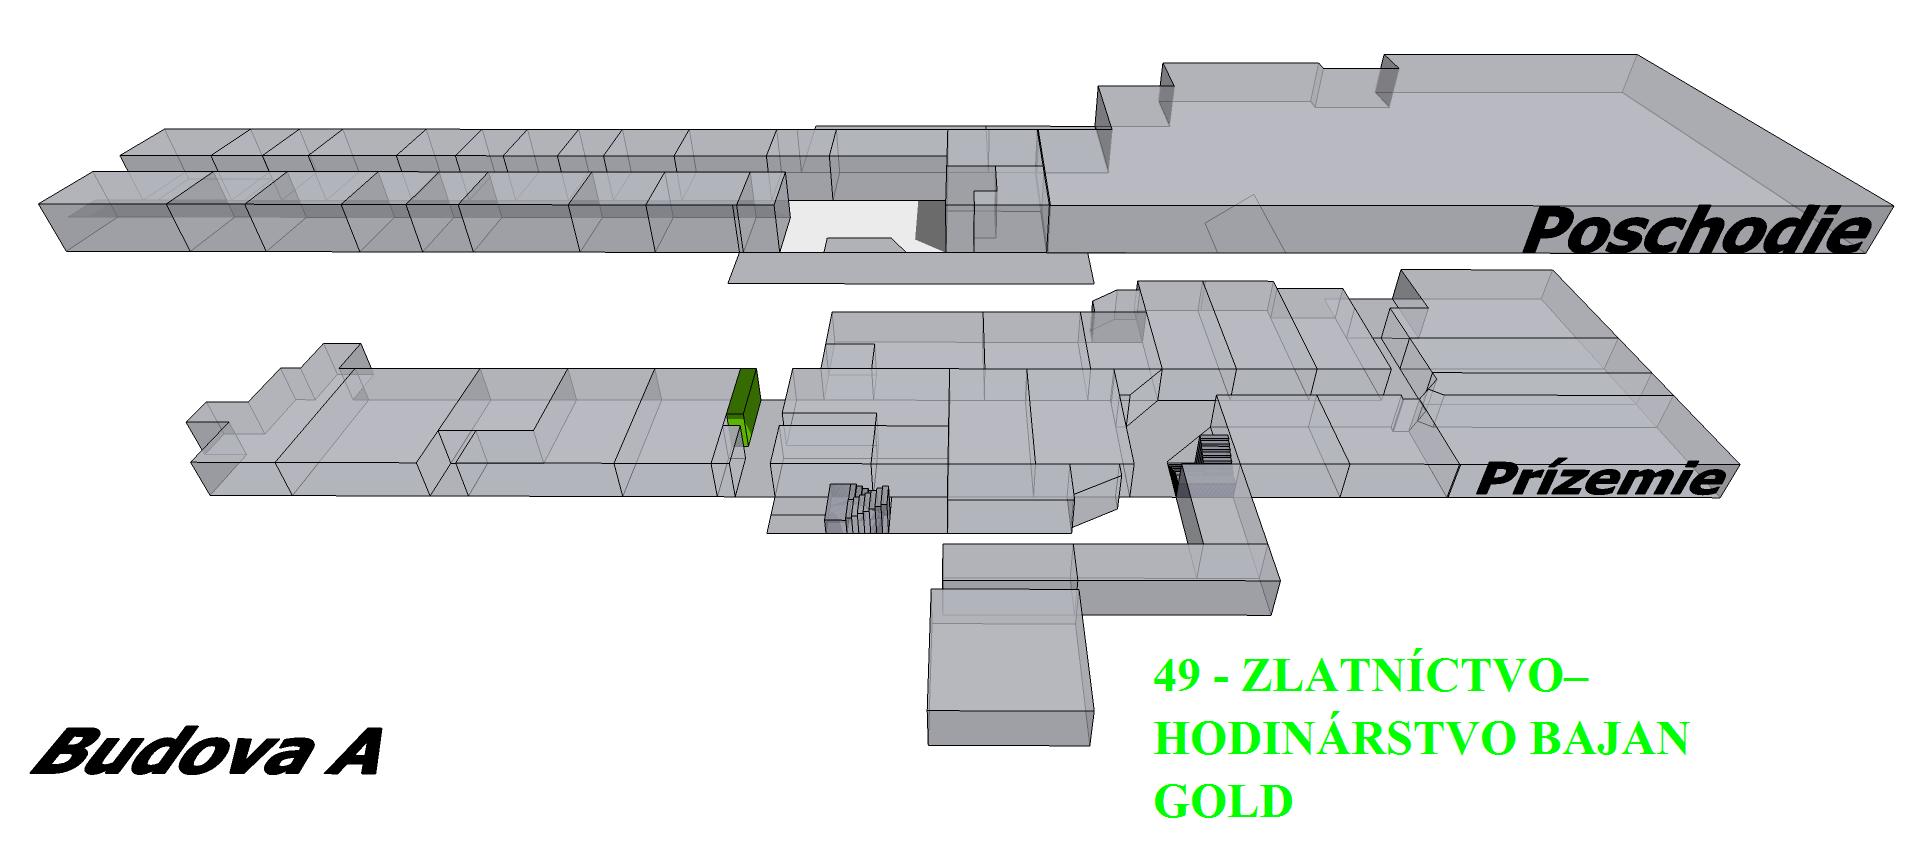 00cb9250e9 Zlatníctvo - hodinárstvo bajan Gold - OC PREMAT